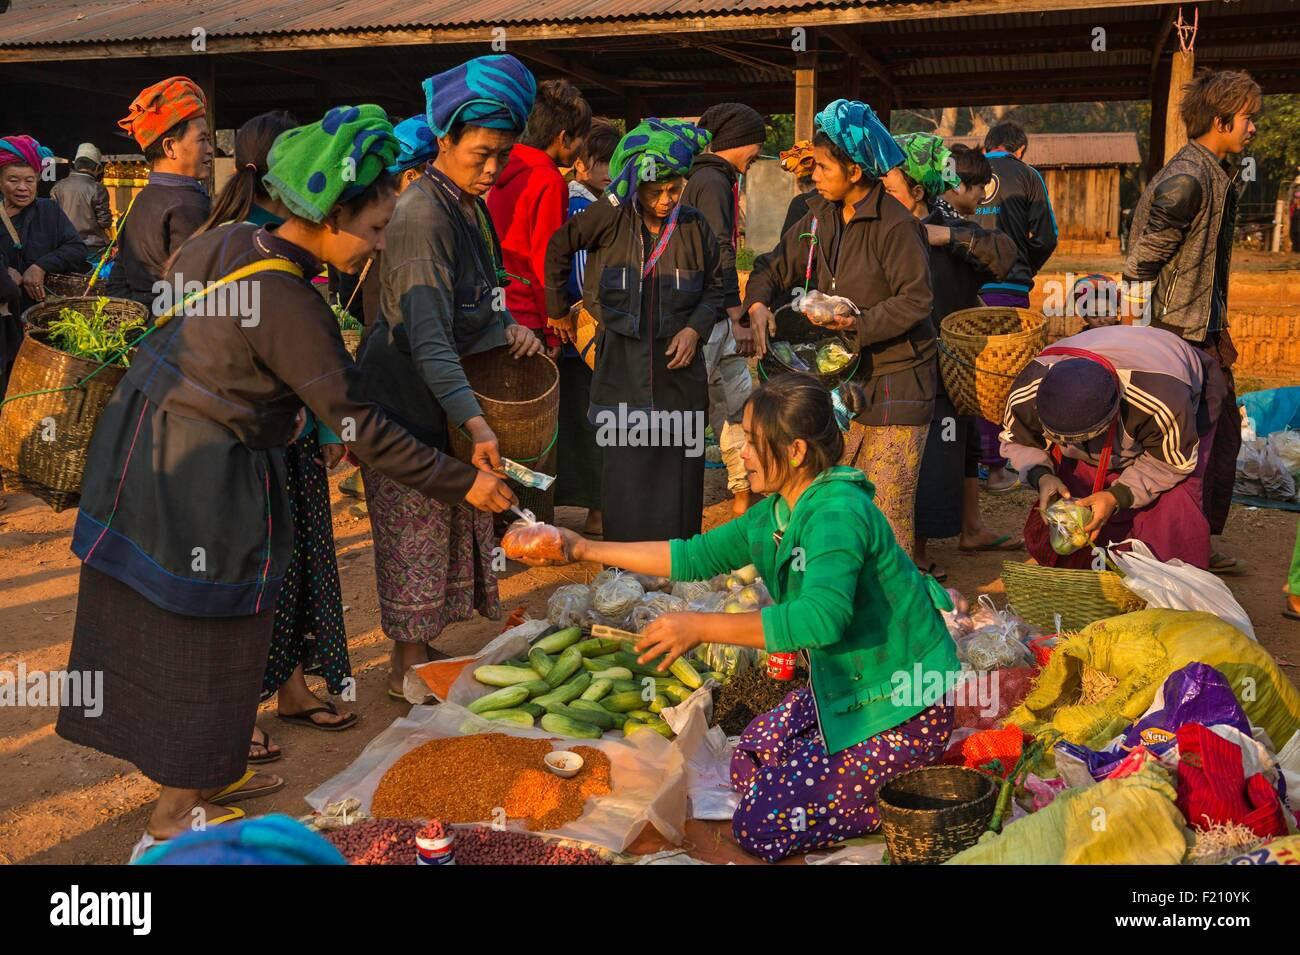 Myanmar (Burma), Shan state, Pa'O tribe, Hamsu, Maha Myatmuni pagoda's market - Stock Image